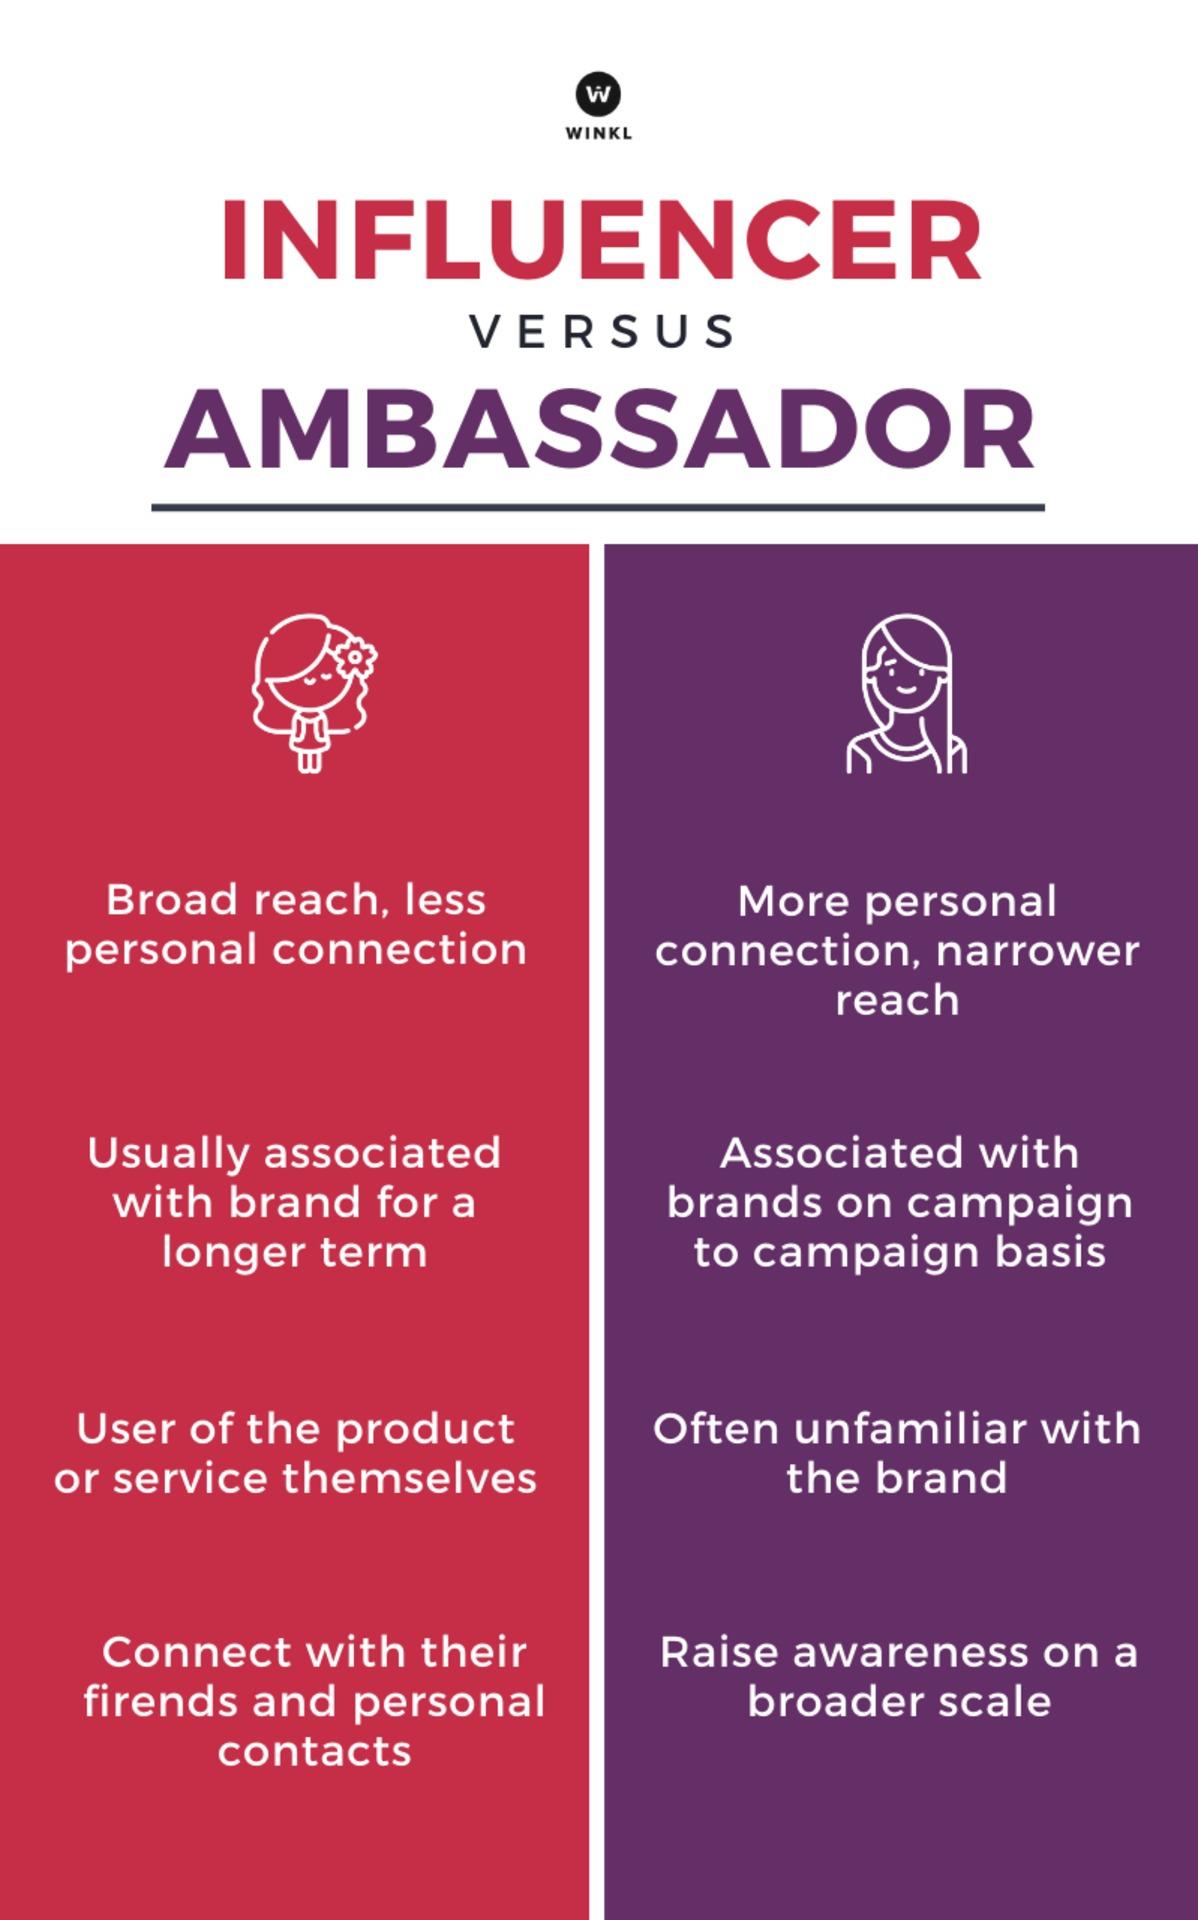 Winkl on Influencer Marketing - Influencer (1)